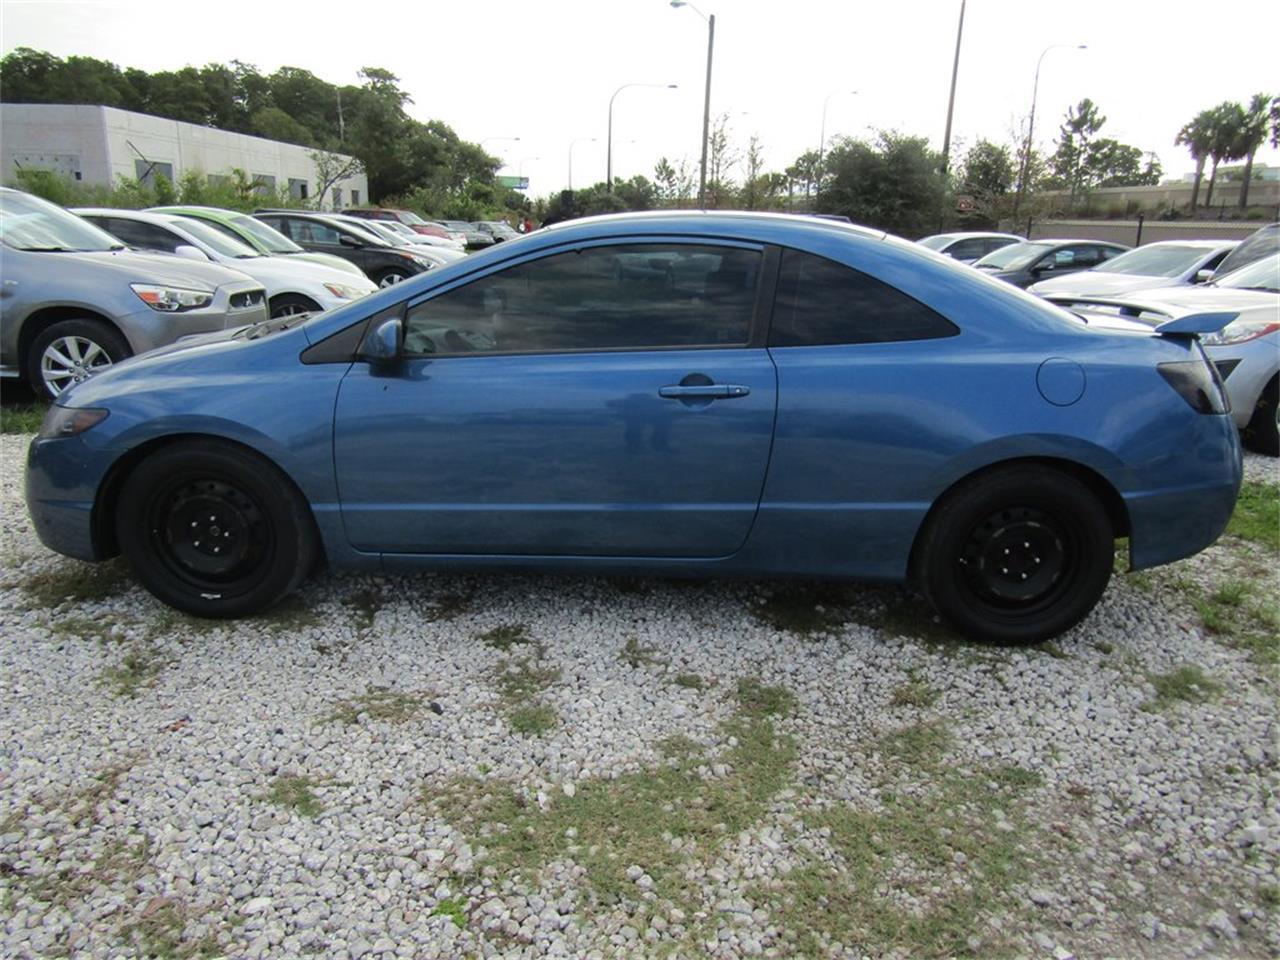 2011 Honda Civic (CC-1254390) for sale in Orlando, Florida